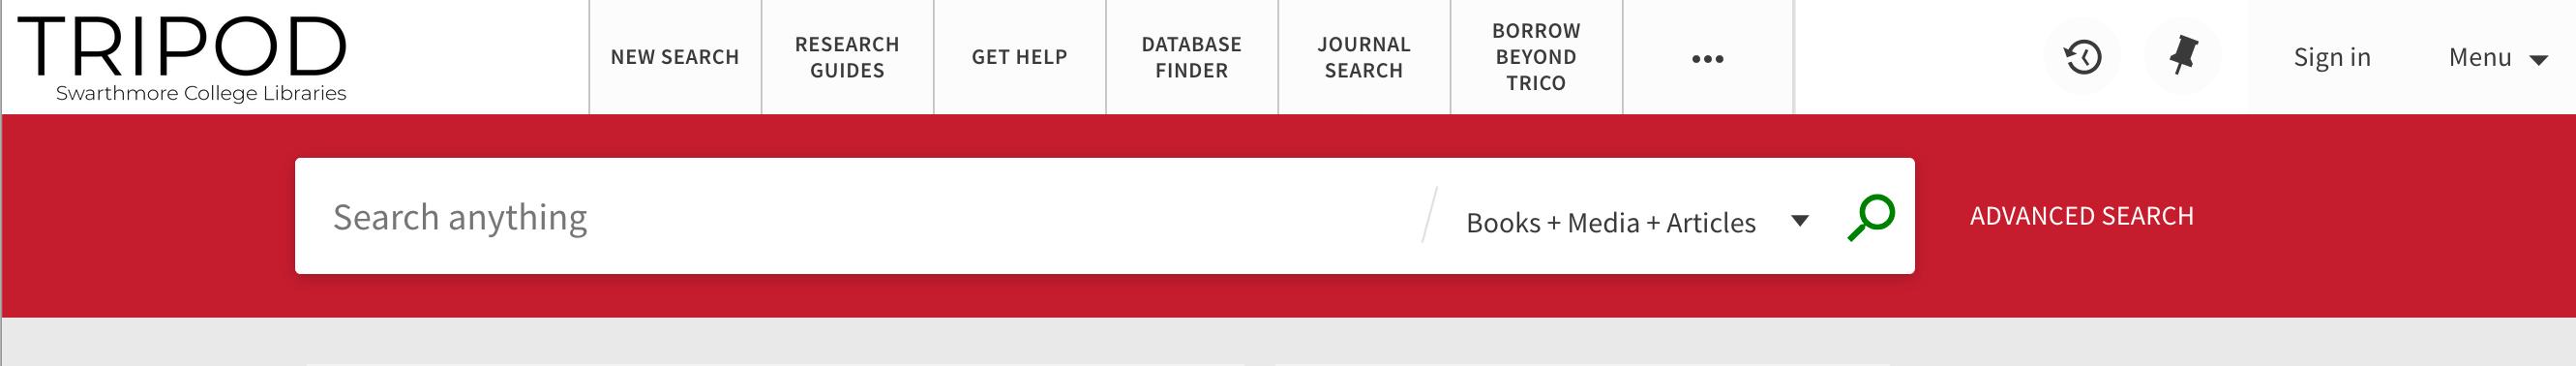 screenshot of tripod website